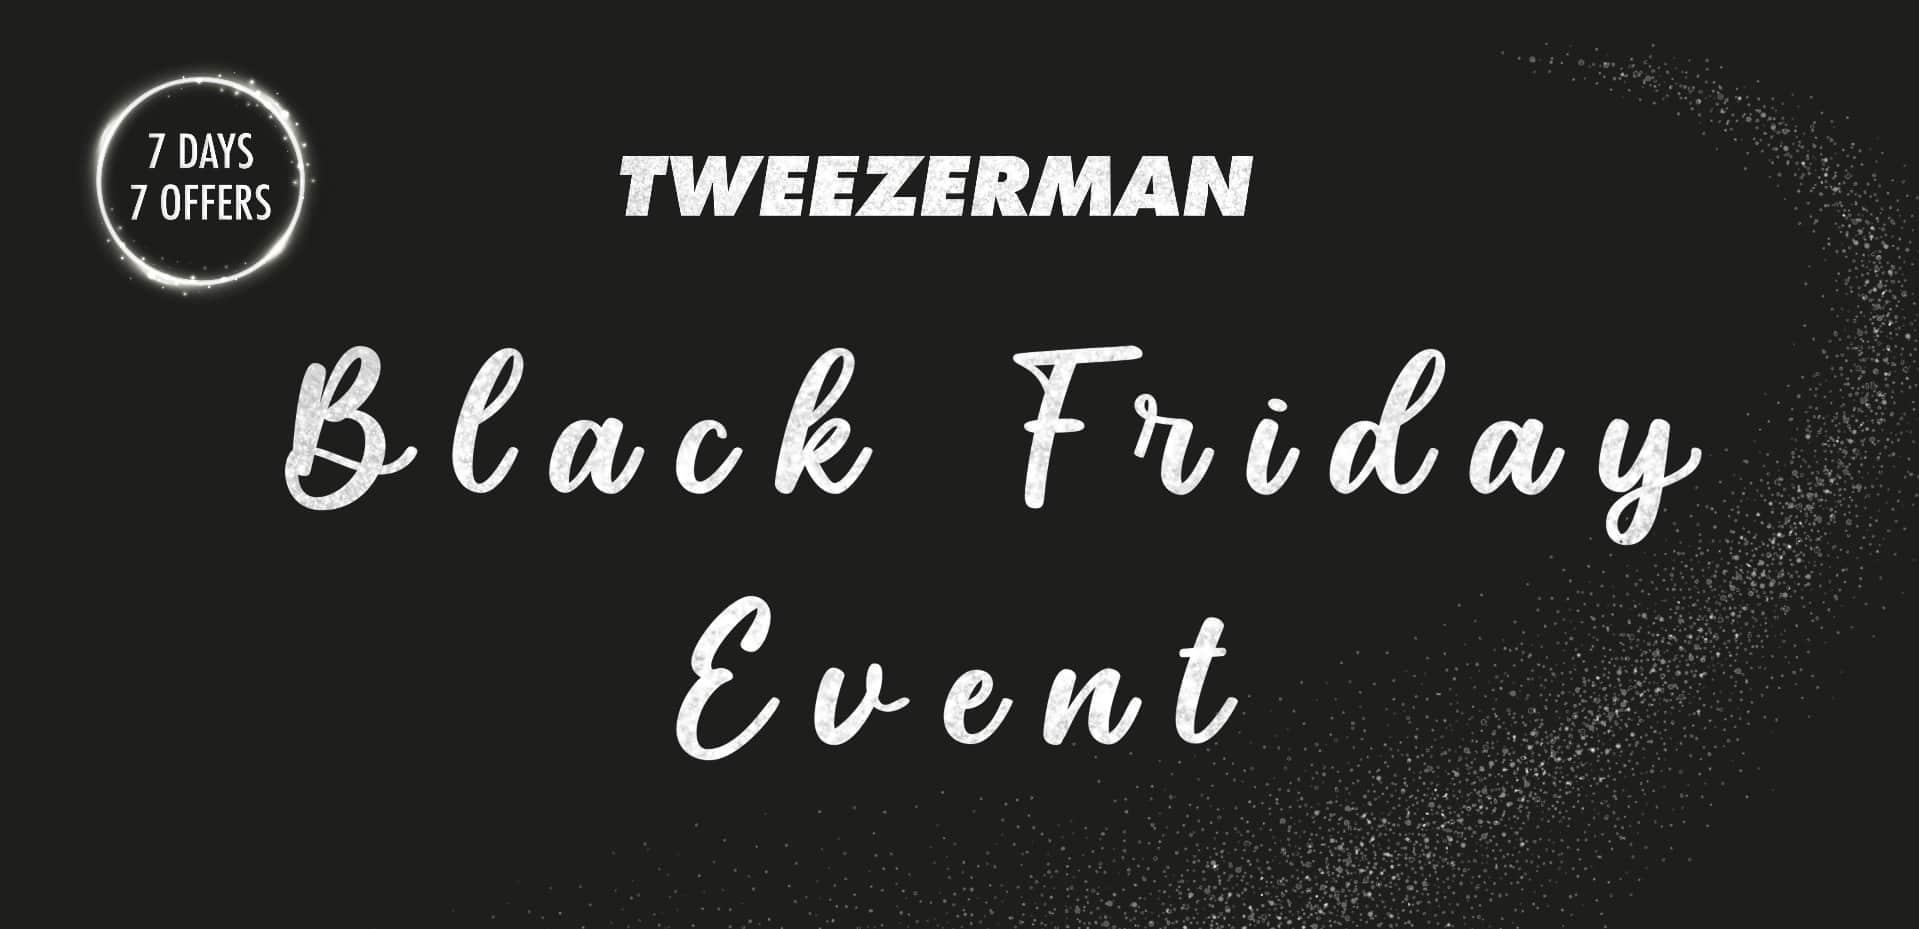 Tweezerman Black Friday Offers